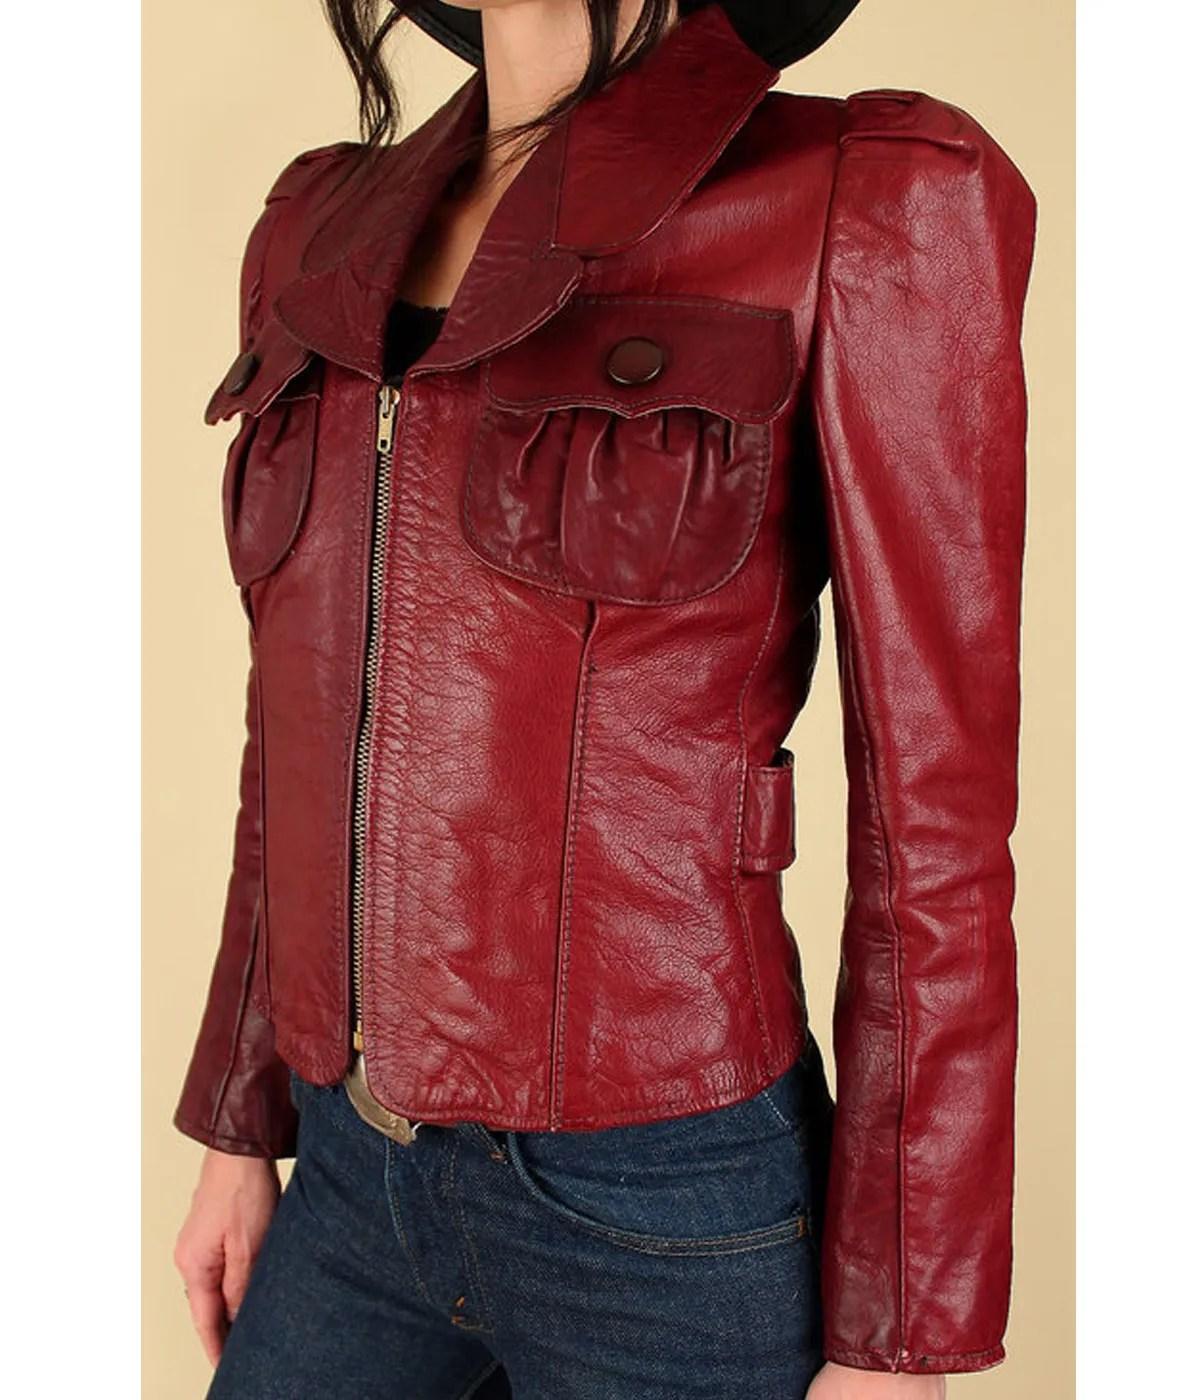 record-safari-vintage-gandalf-leather-jacket